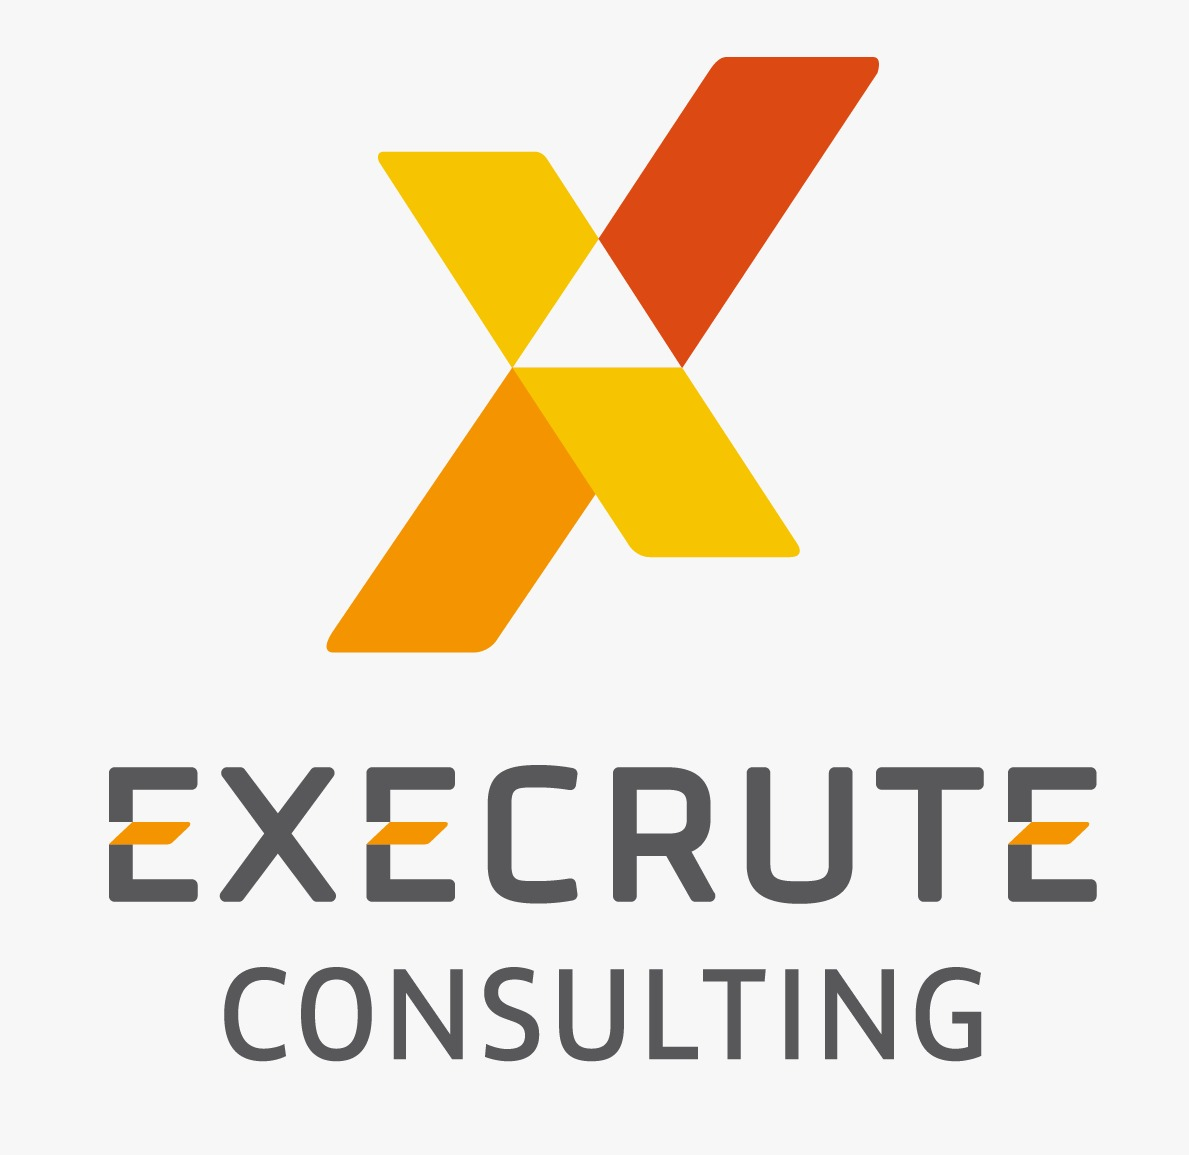 Pt Patner Sukses Indonesia (Execrute Consulting)